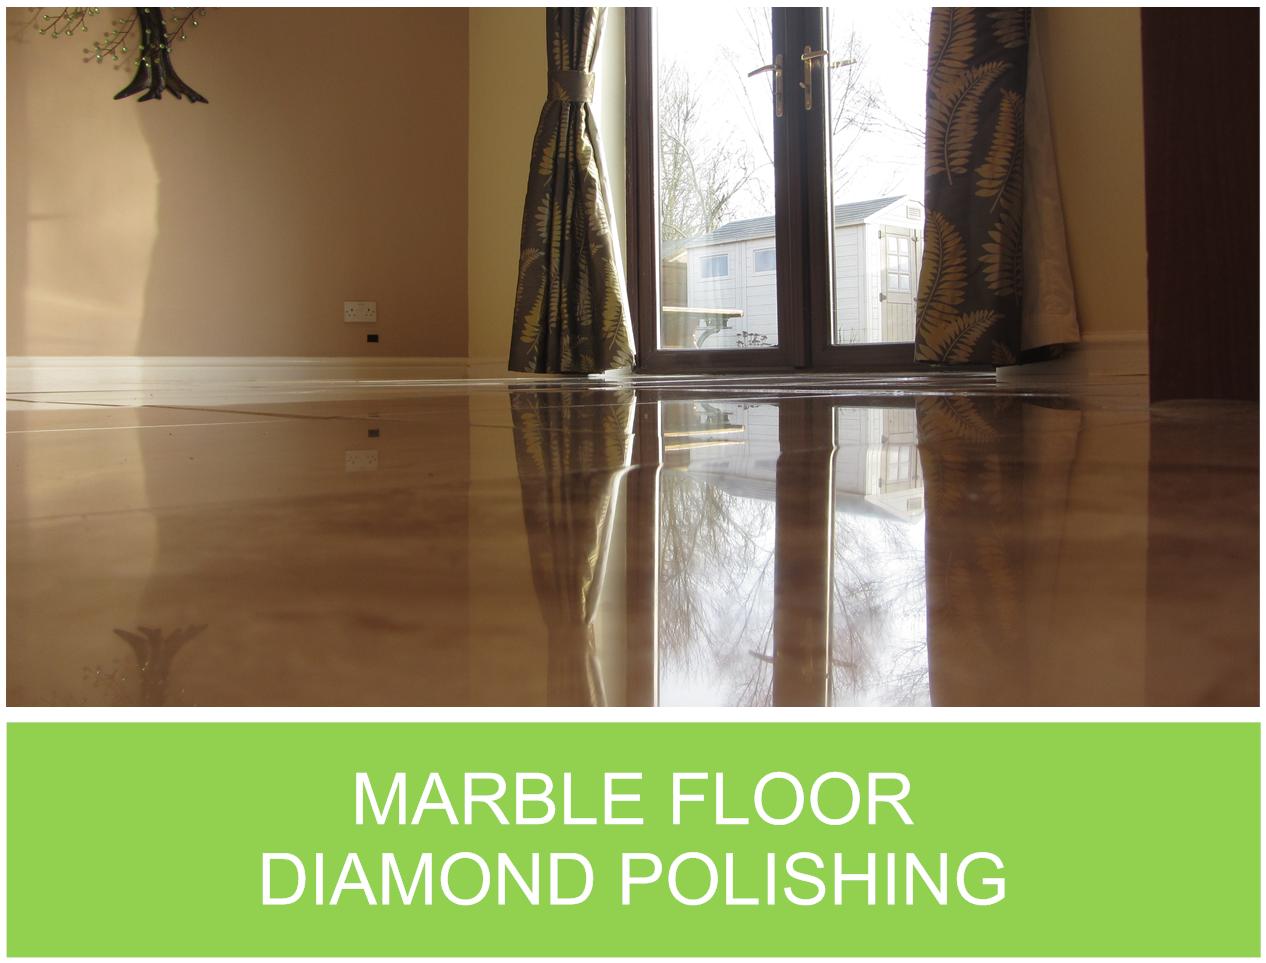 Marble Floor Cleaning Sealing Diamond Polishing High Shine - How to polish marble floors by machine